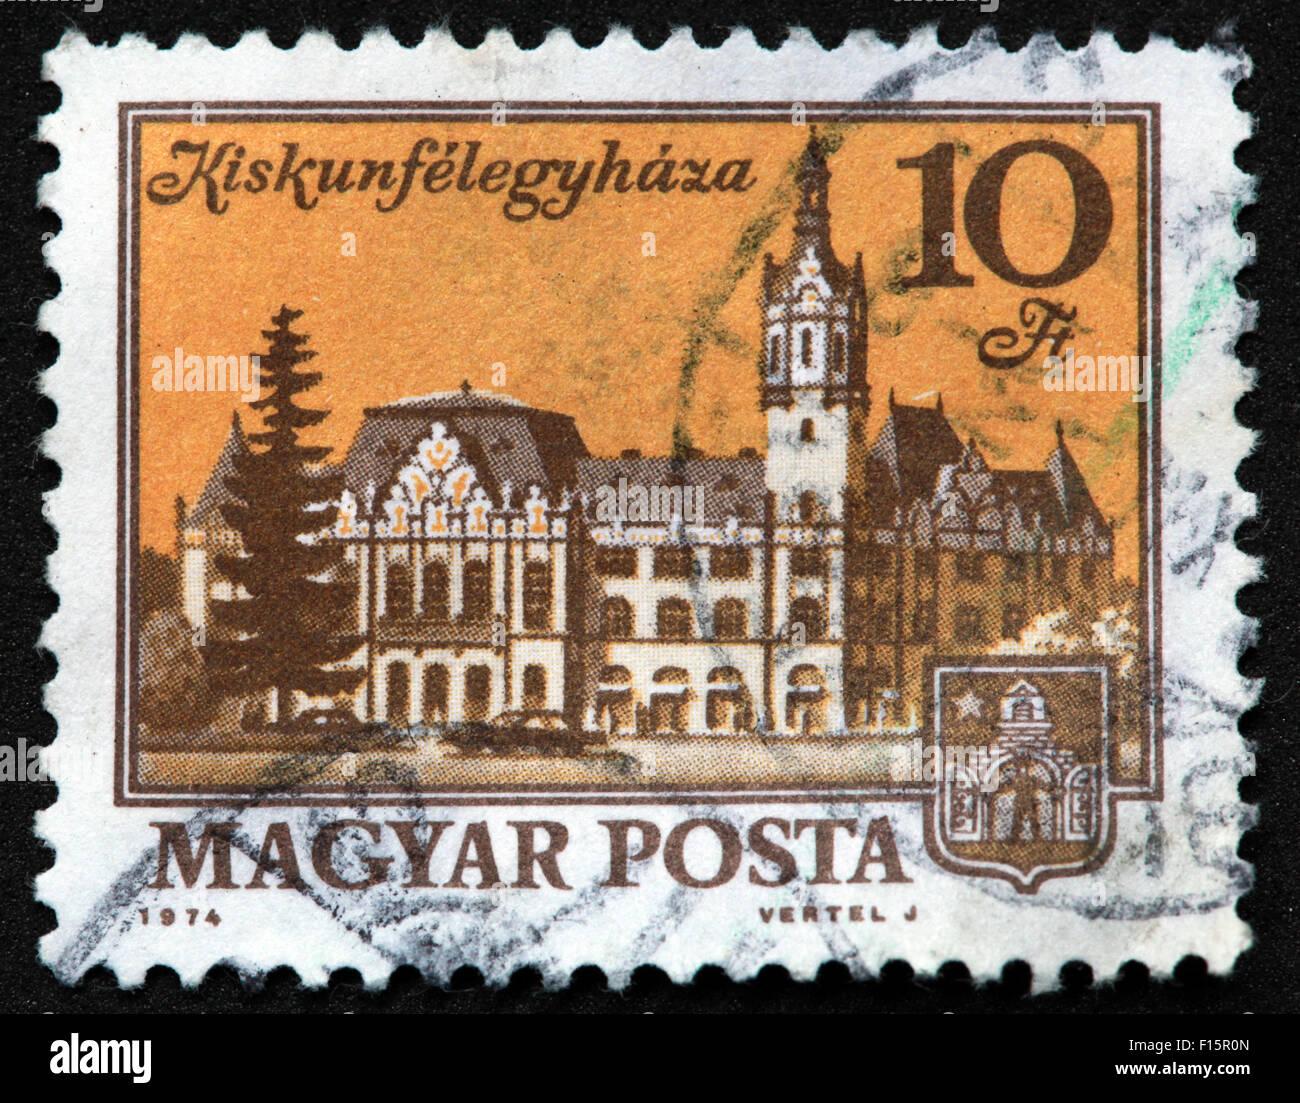 Magyar Posta 1974 Vertel J Kiskunfelegyhaza 10Ft castle house Stamp Stock Photo